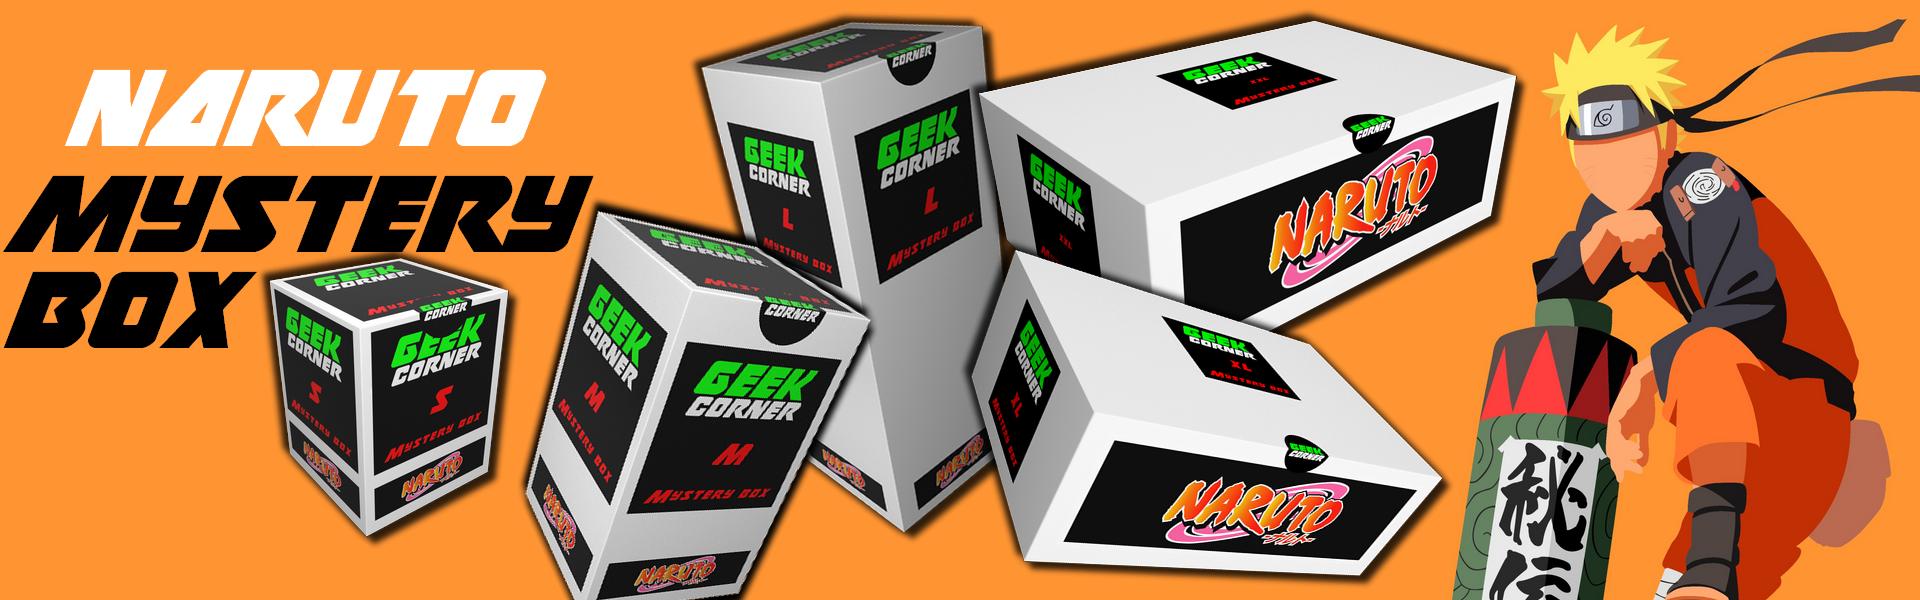 Naruto mystery boxok